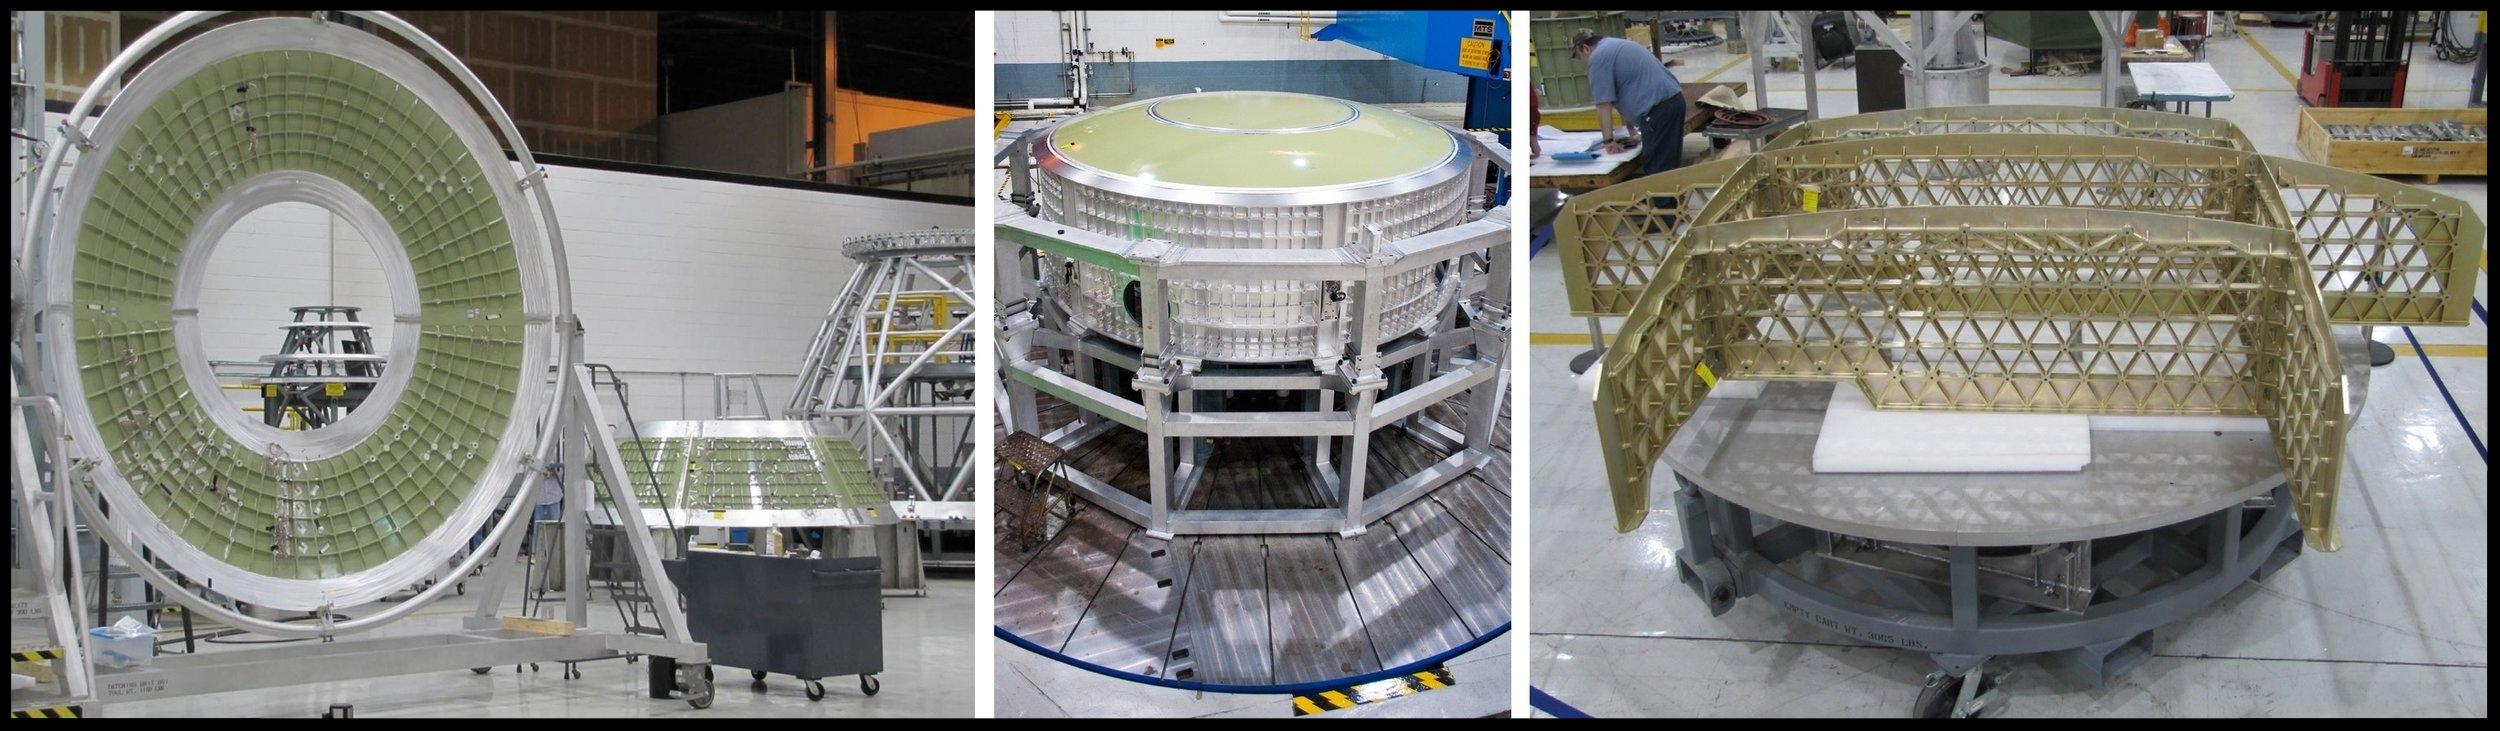 Forward Bulkhead, Aft Bulkhead & Barrel, Backbone Structure.jpg